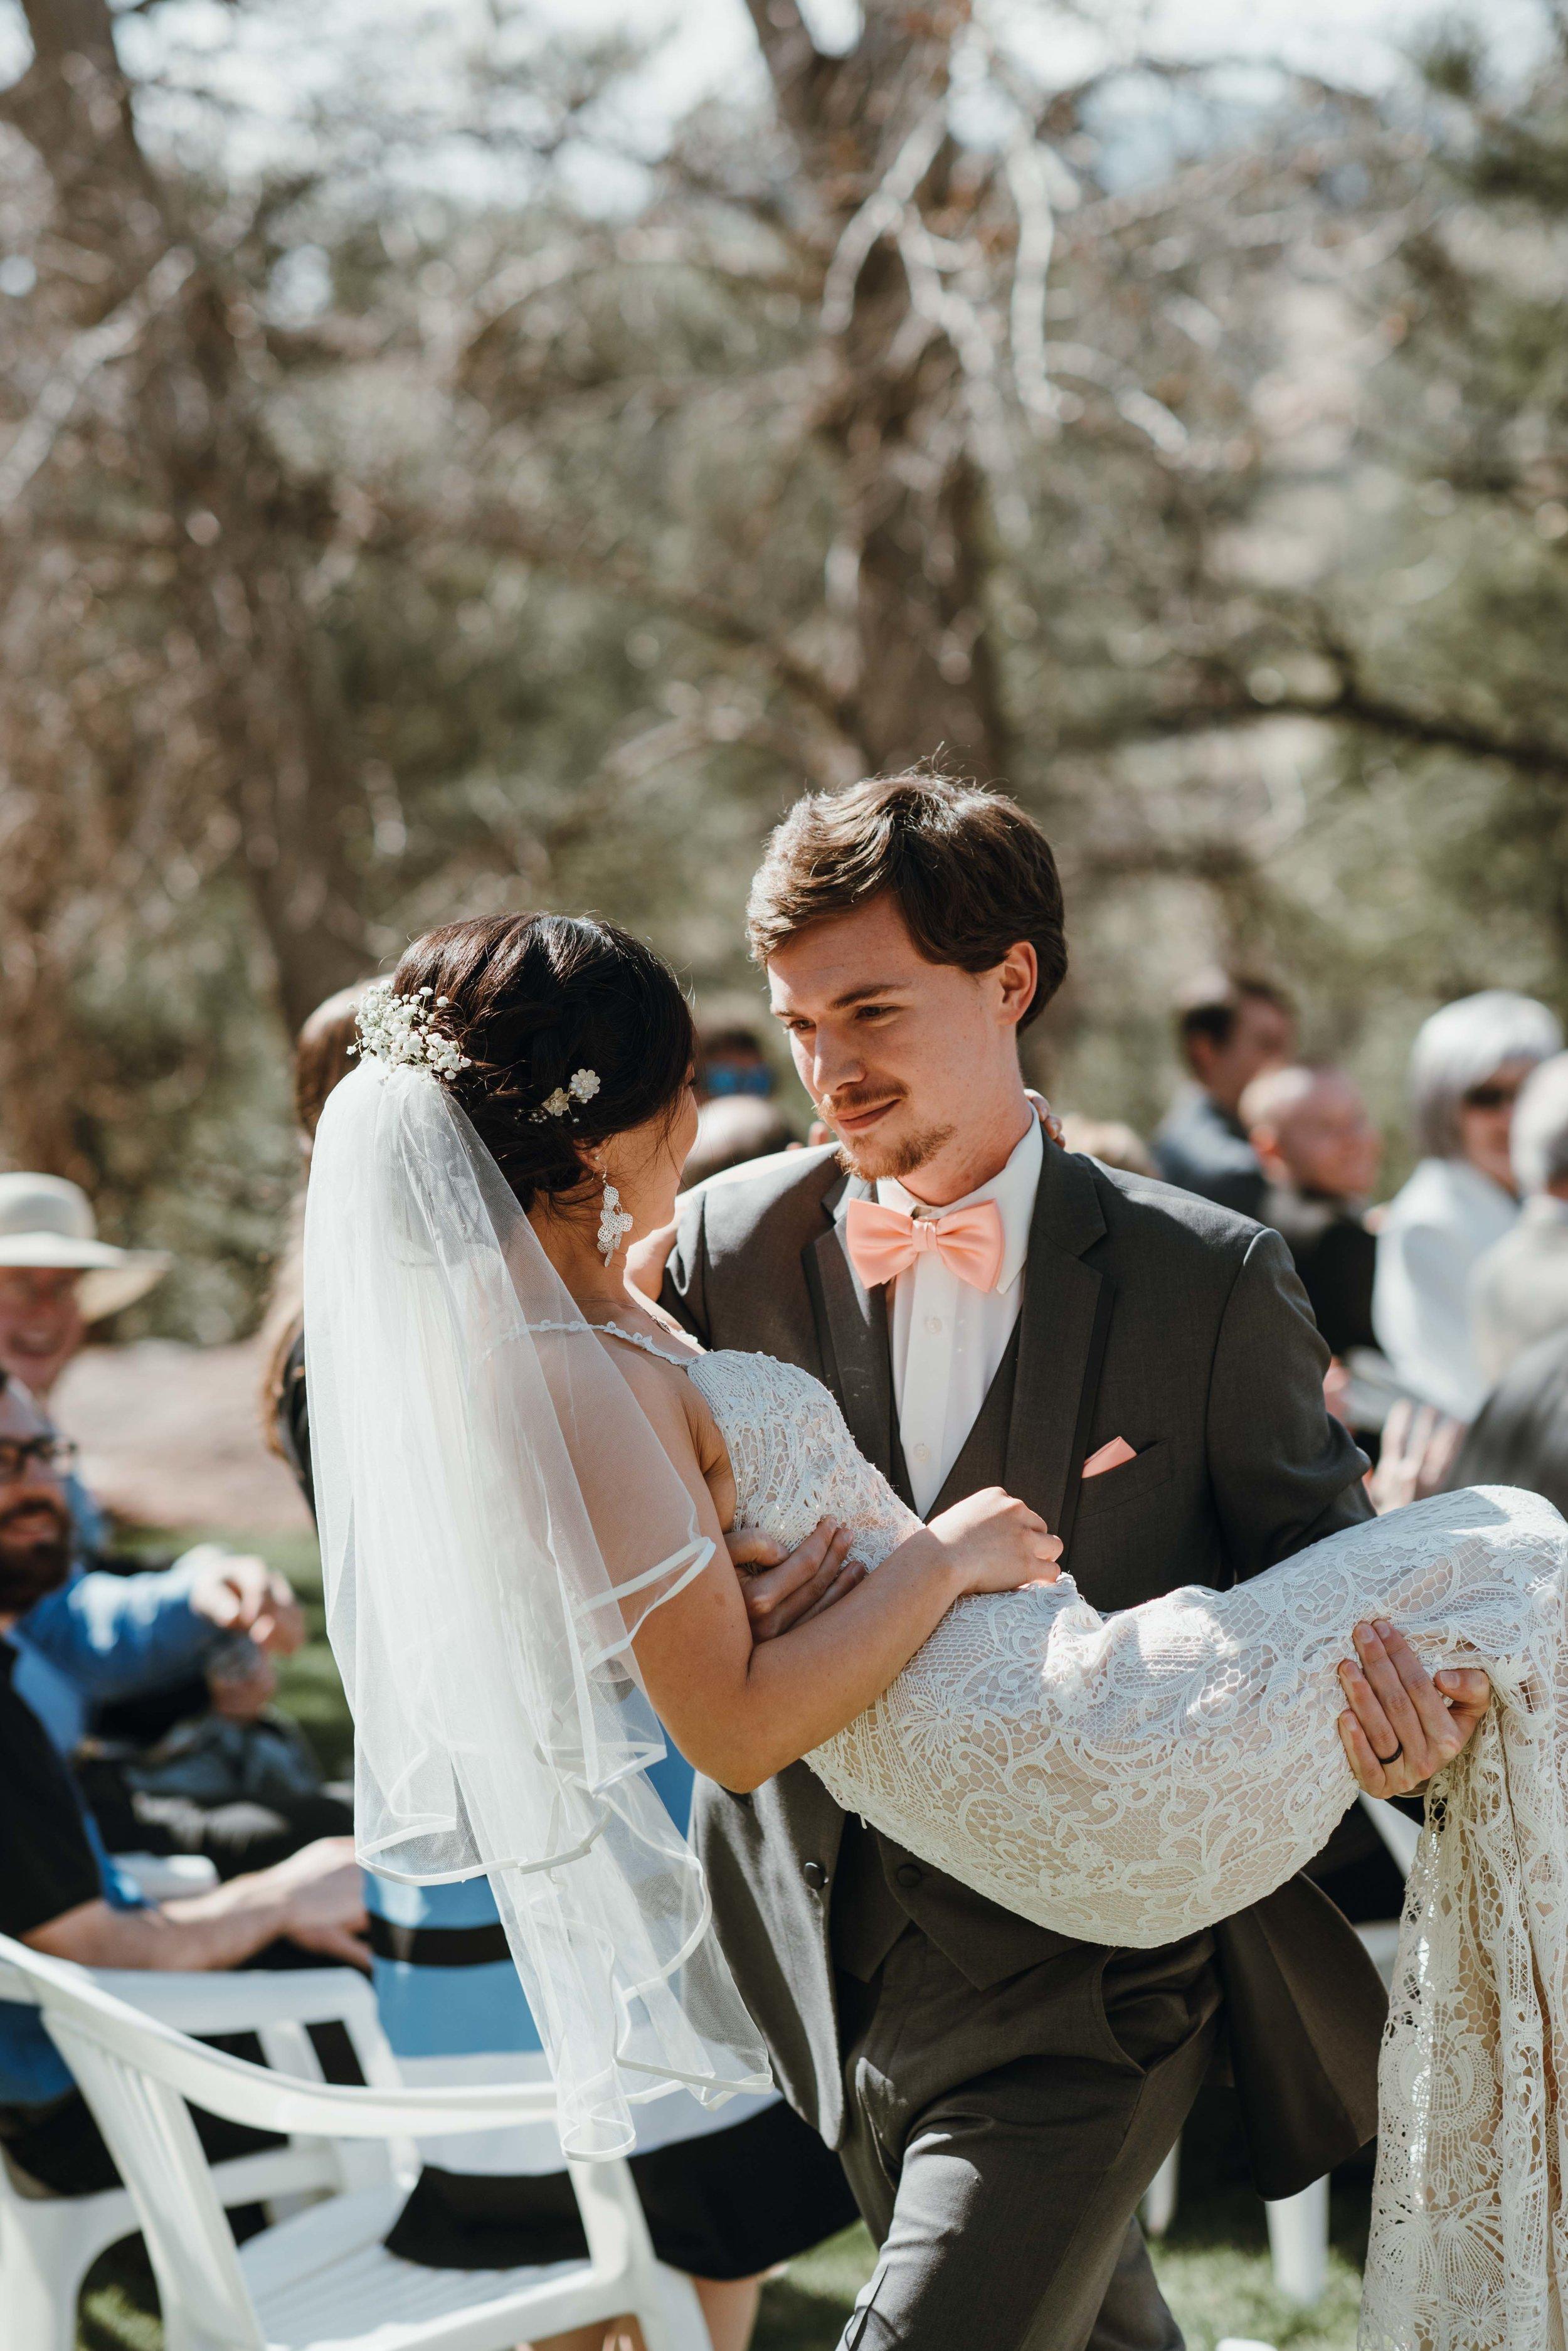 denver wedding photographer lioncrest manor in lyons ben and mali -DSC_1647.jpg